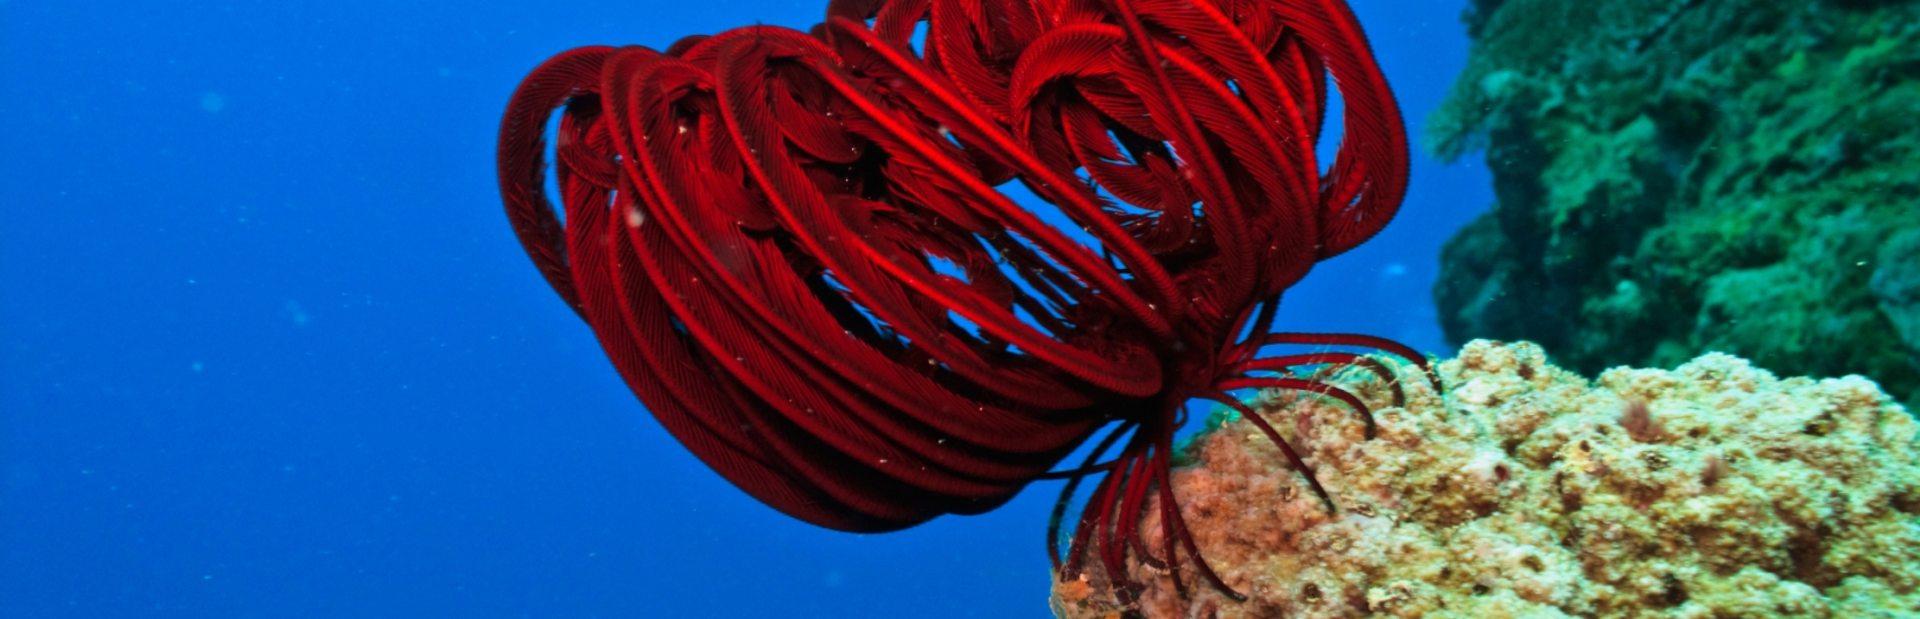 Egypt & Red Sea climate photo